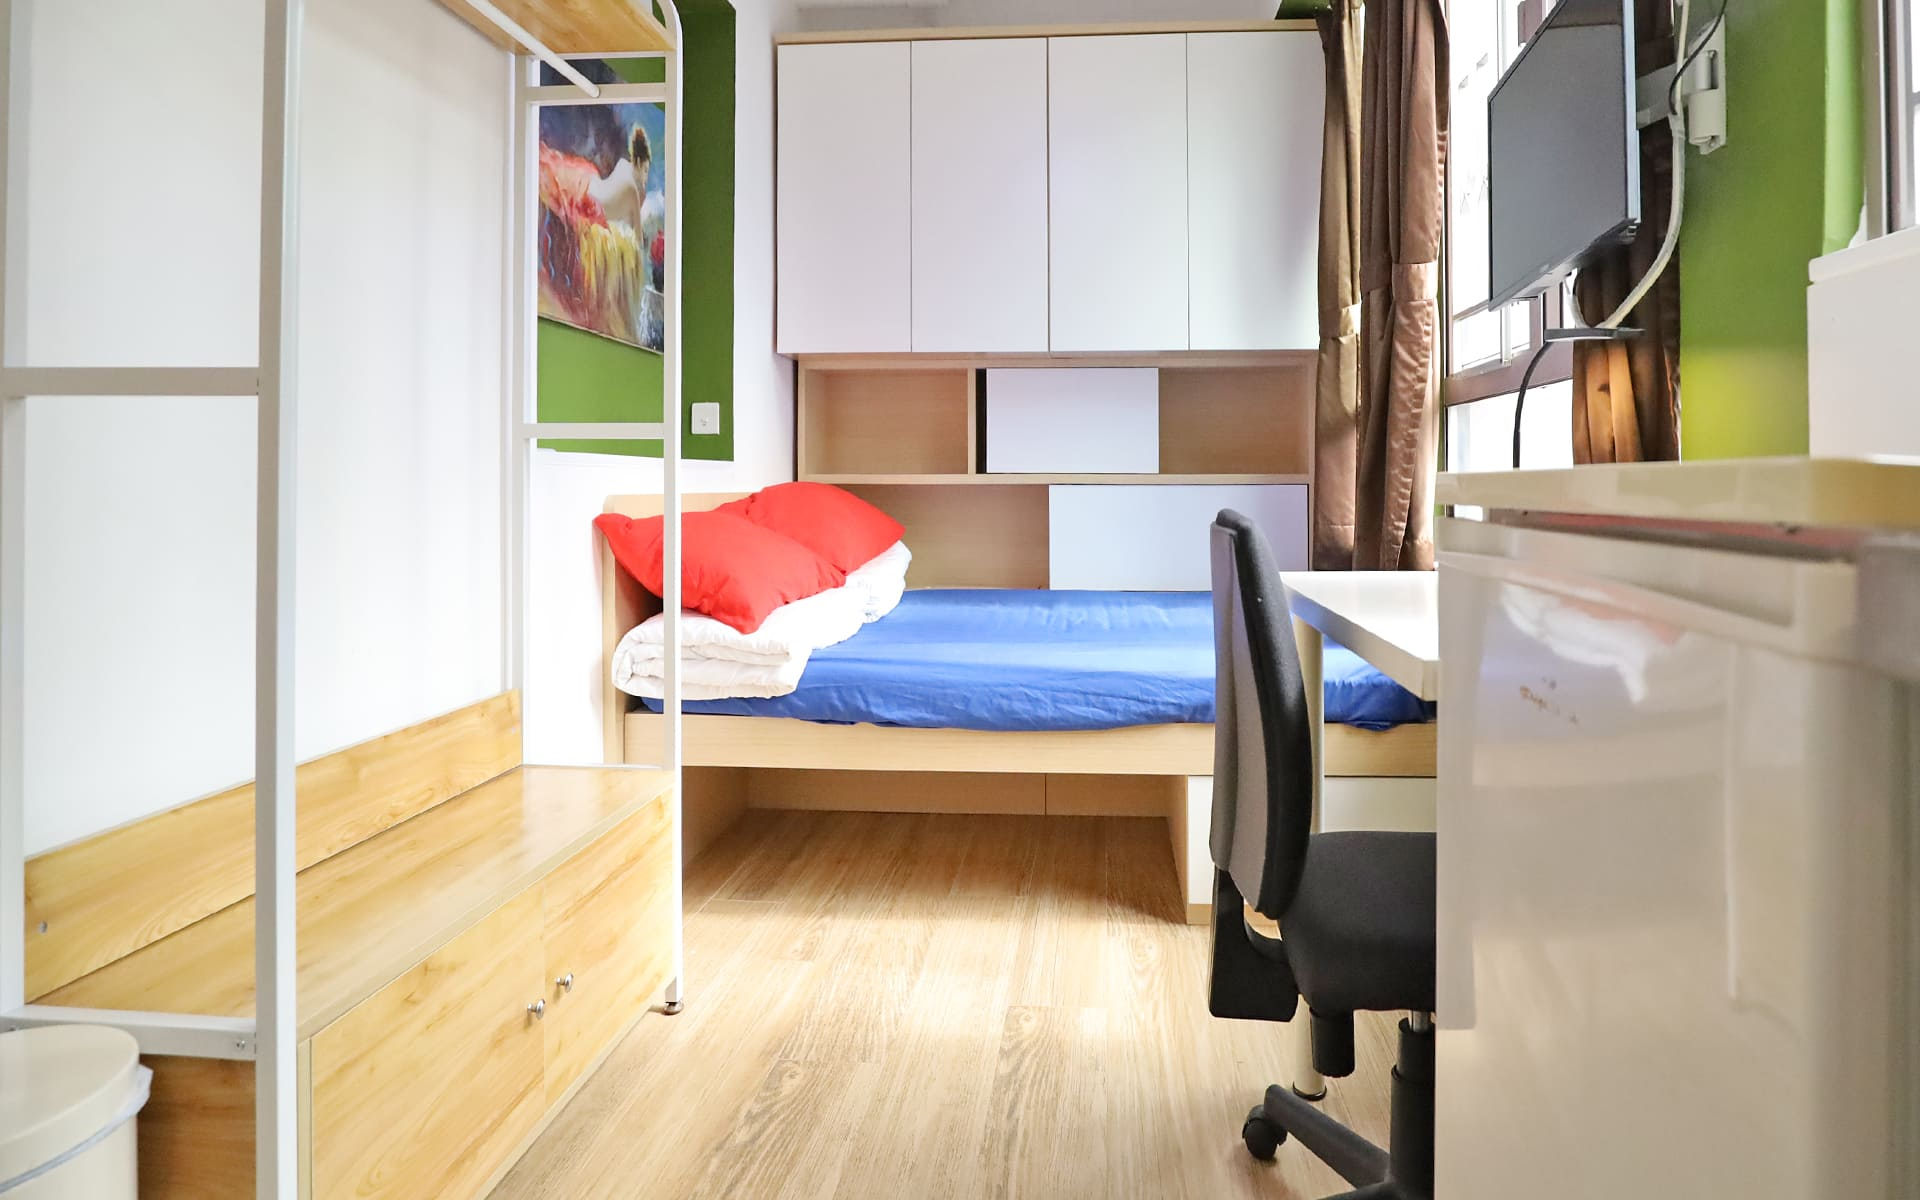 hk_service_apartment_1975971631580801987.jpg